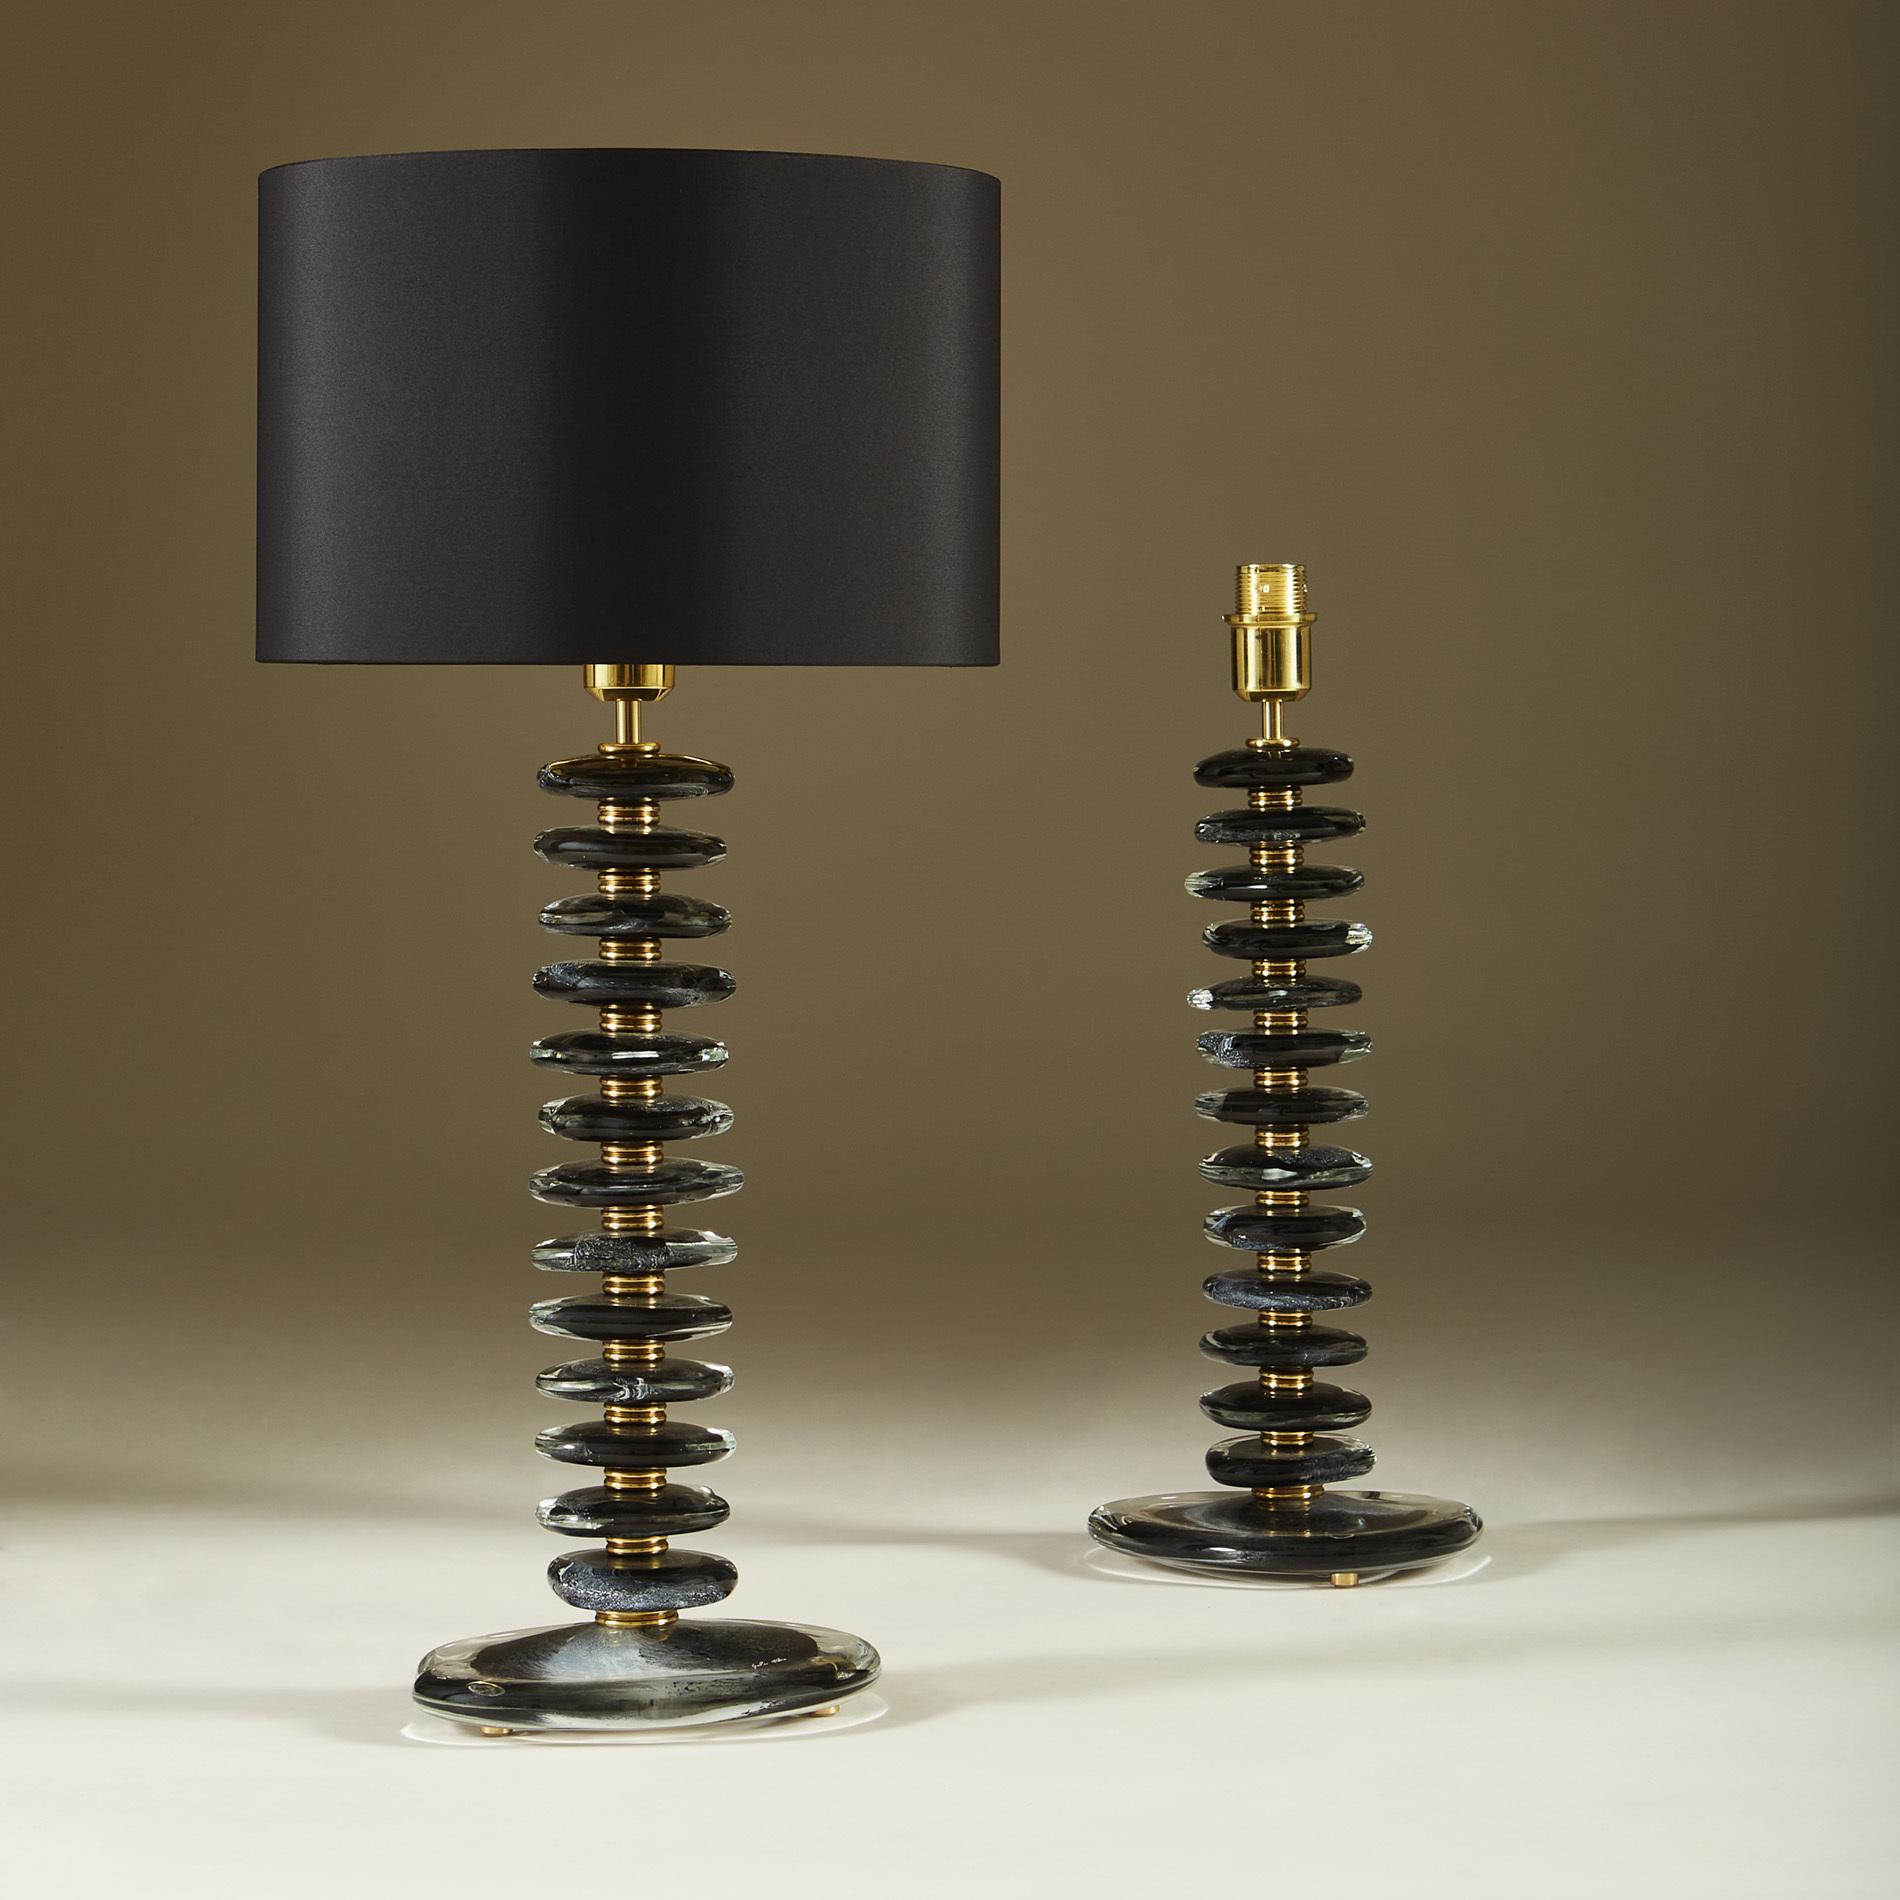 Black Murano Pebble Lamps 040 V1